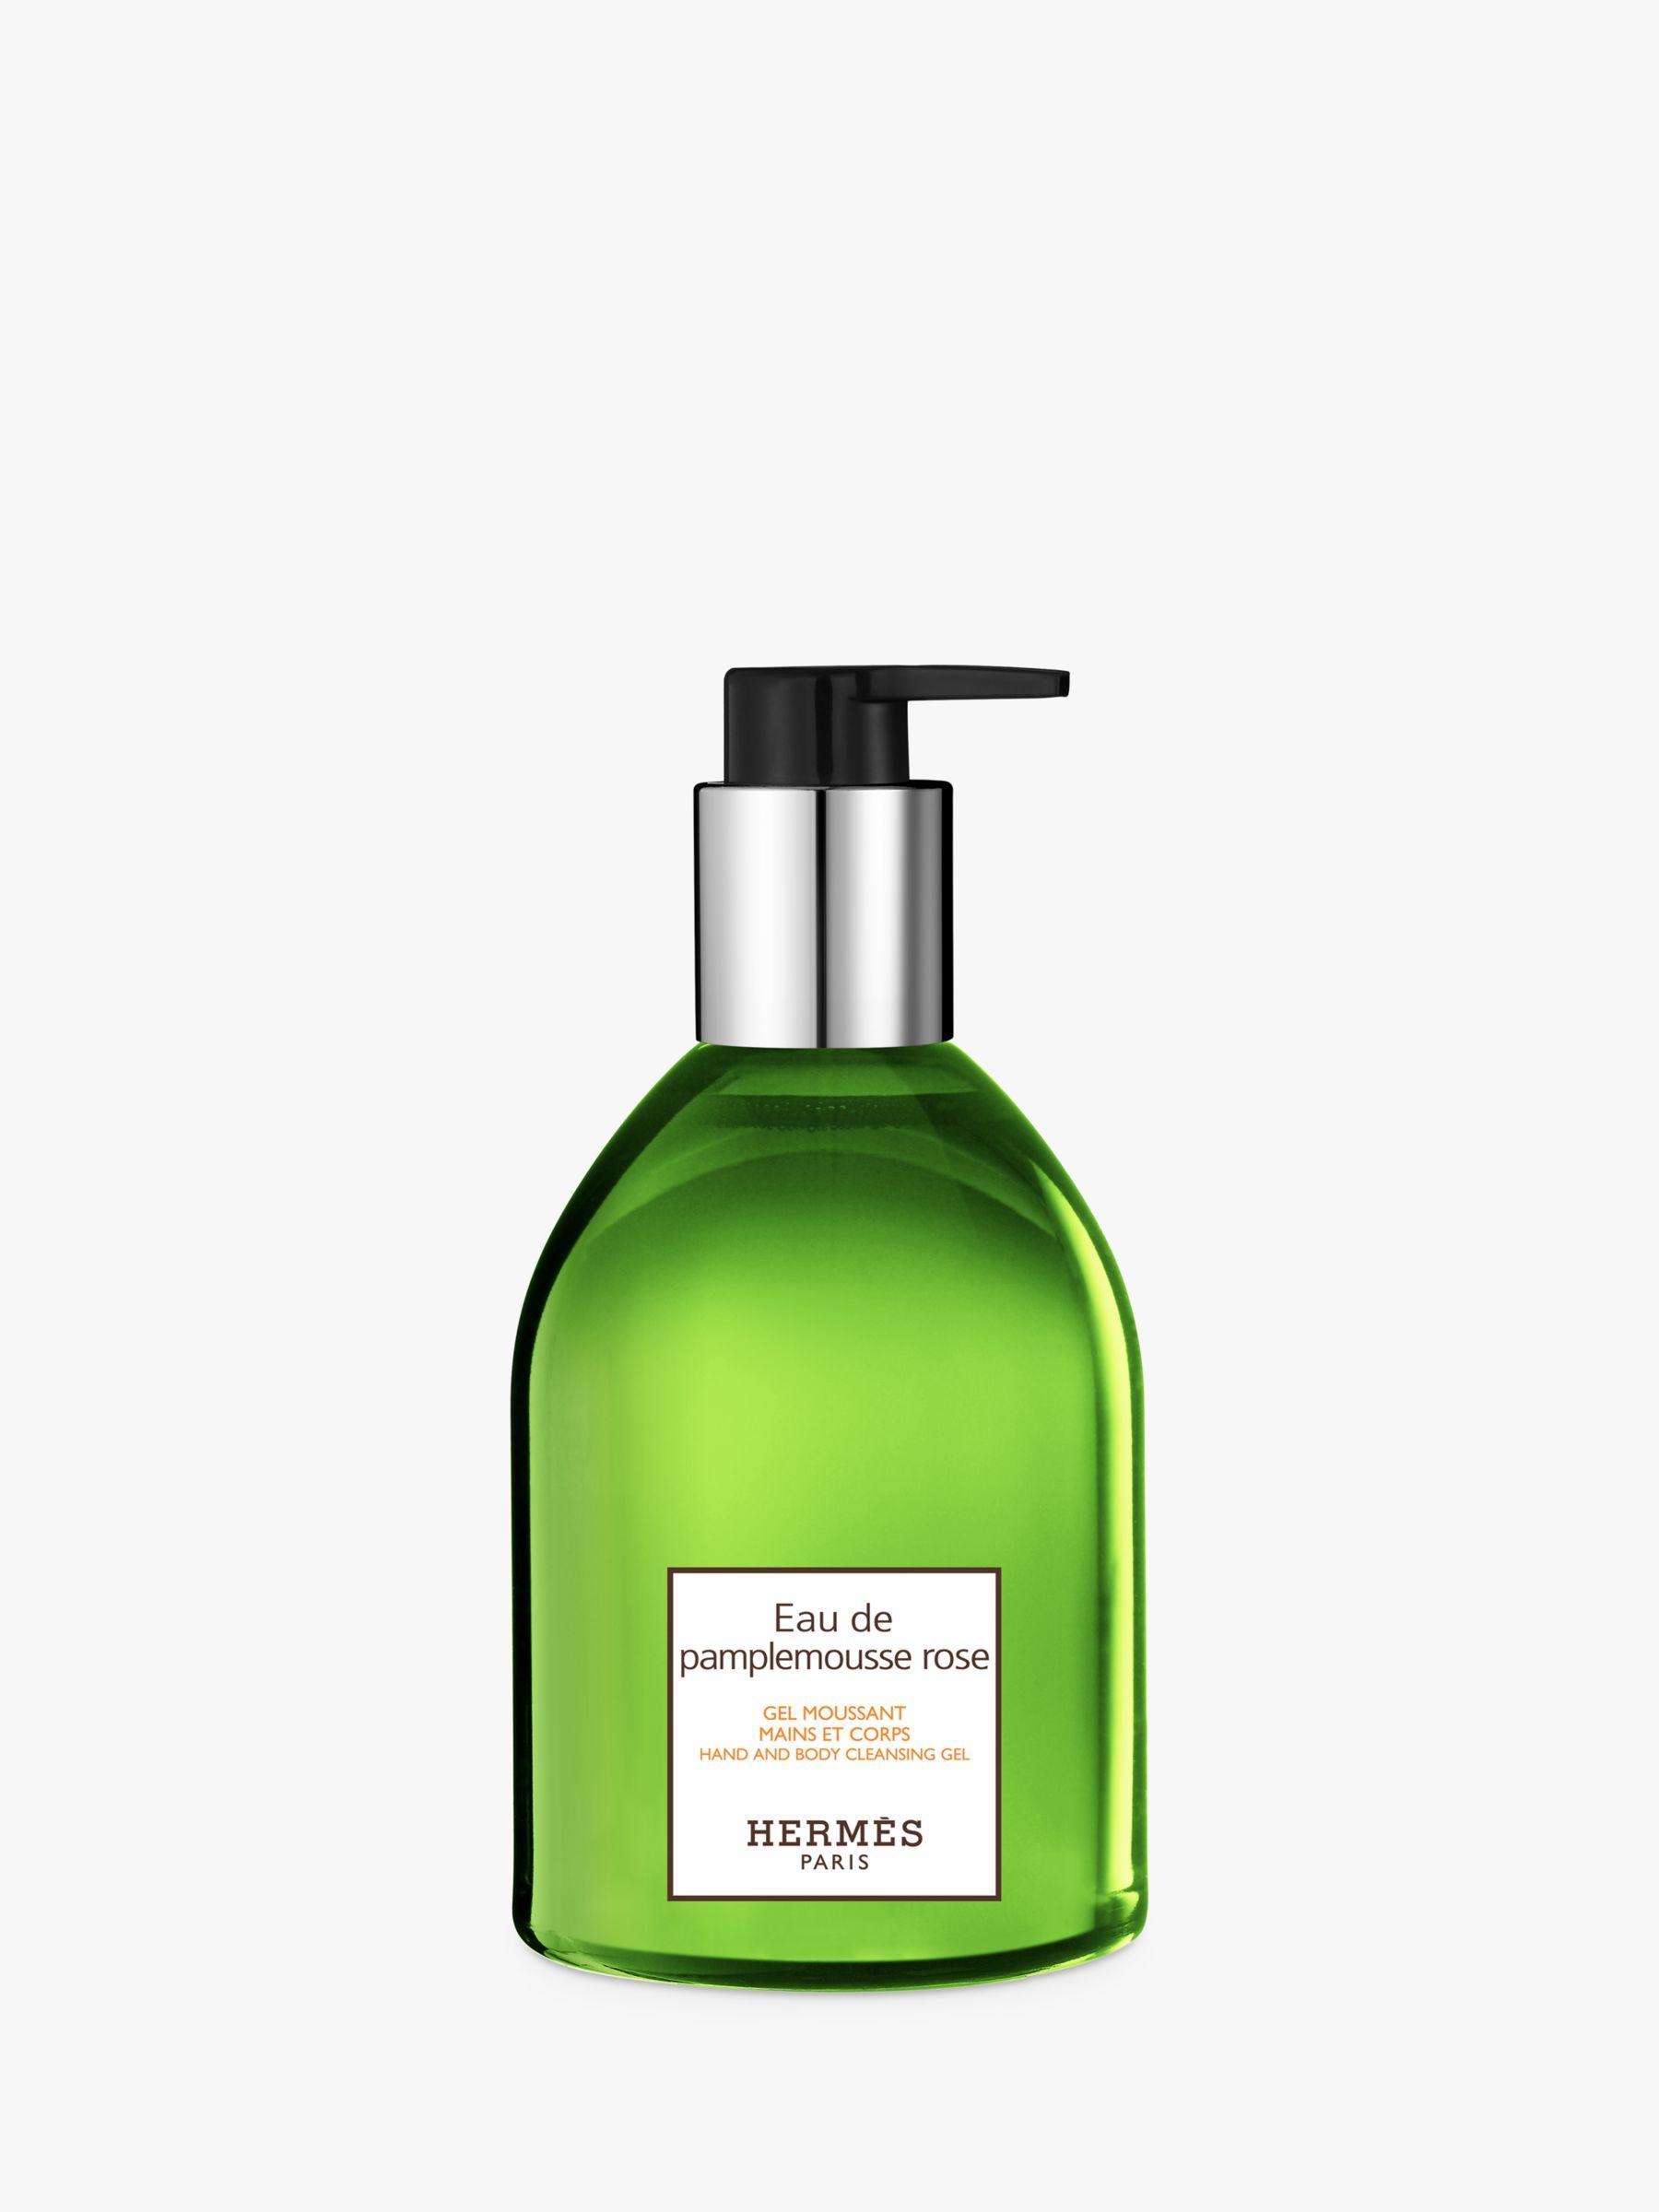 Hermes HERMÈS Eau de Pamplemousse Rose Hand & Body Cleansing Gel, 300ml